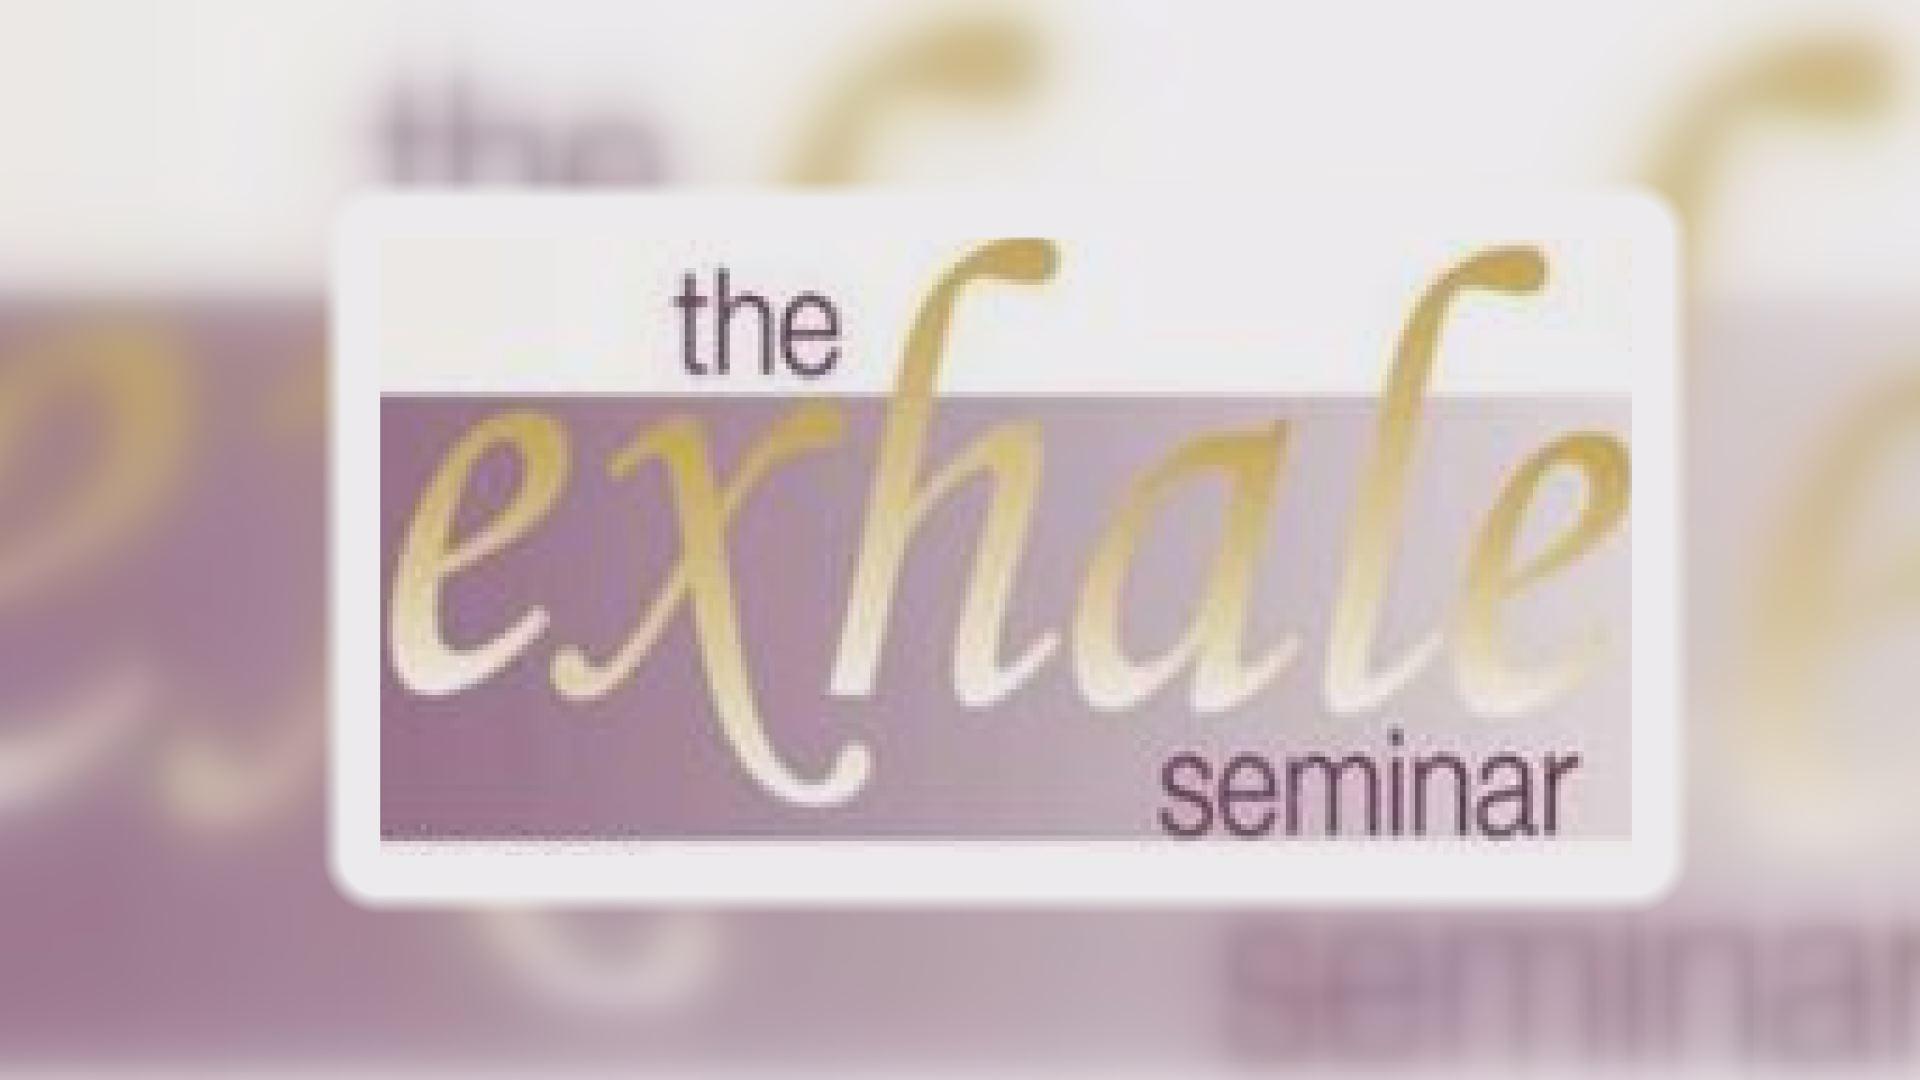 produced-exhale-seminar_216235